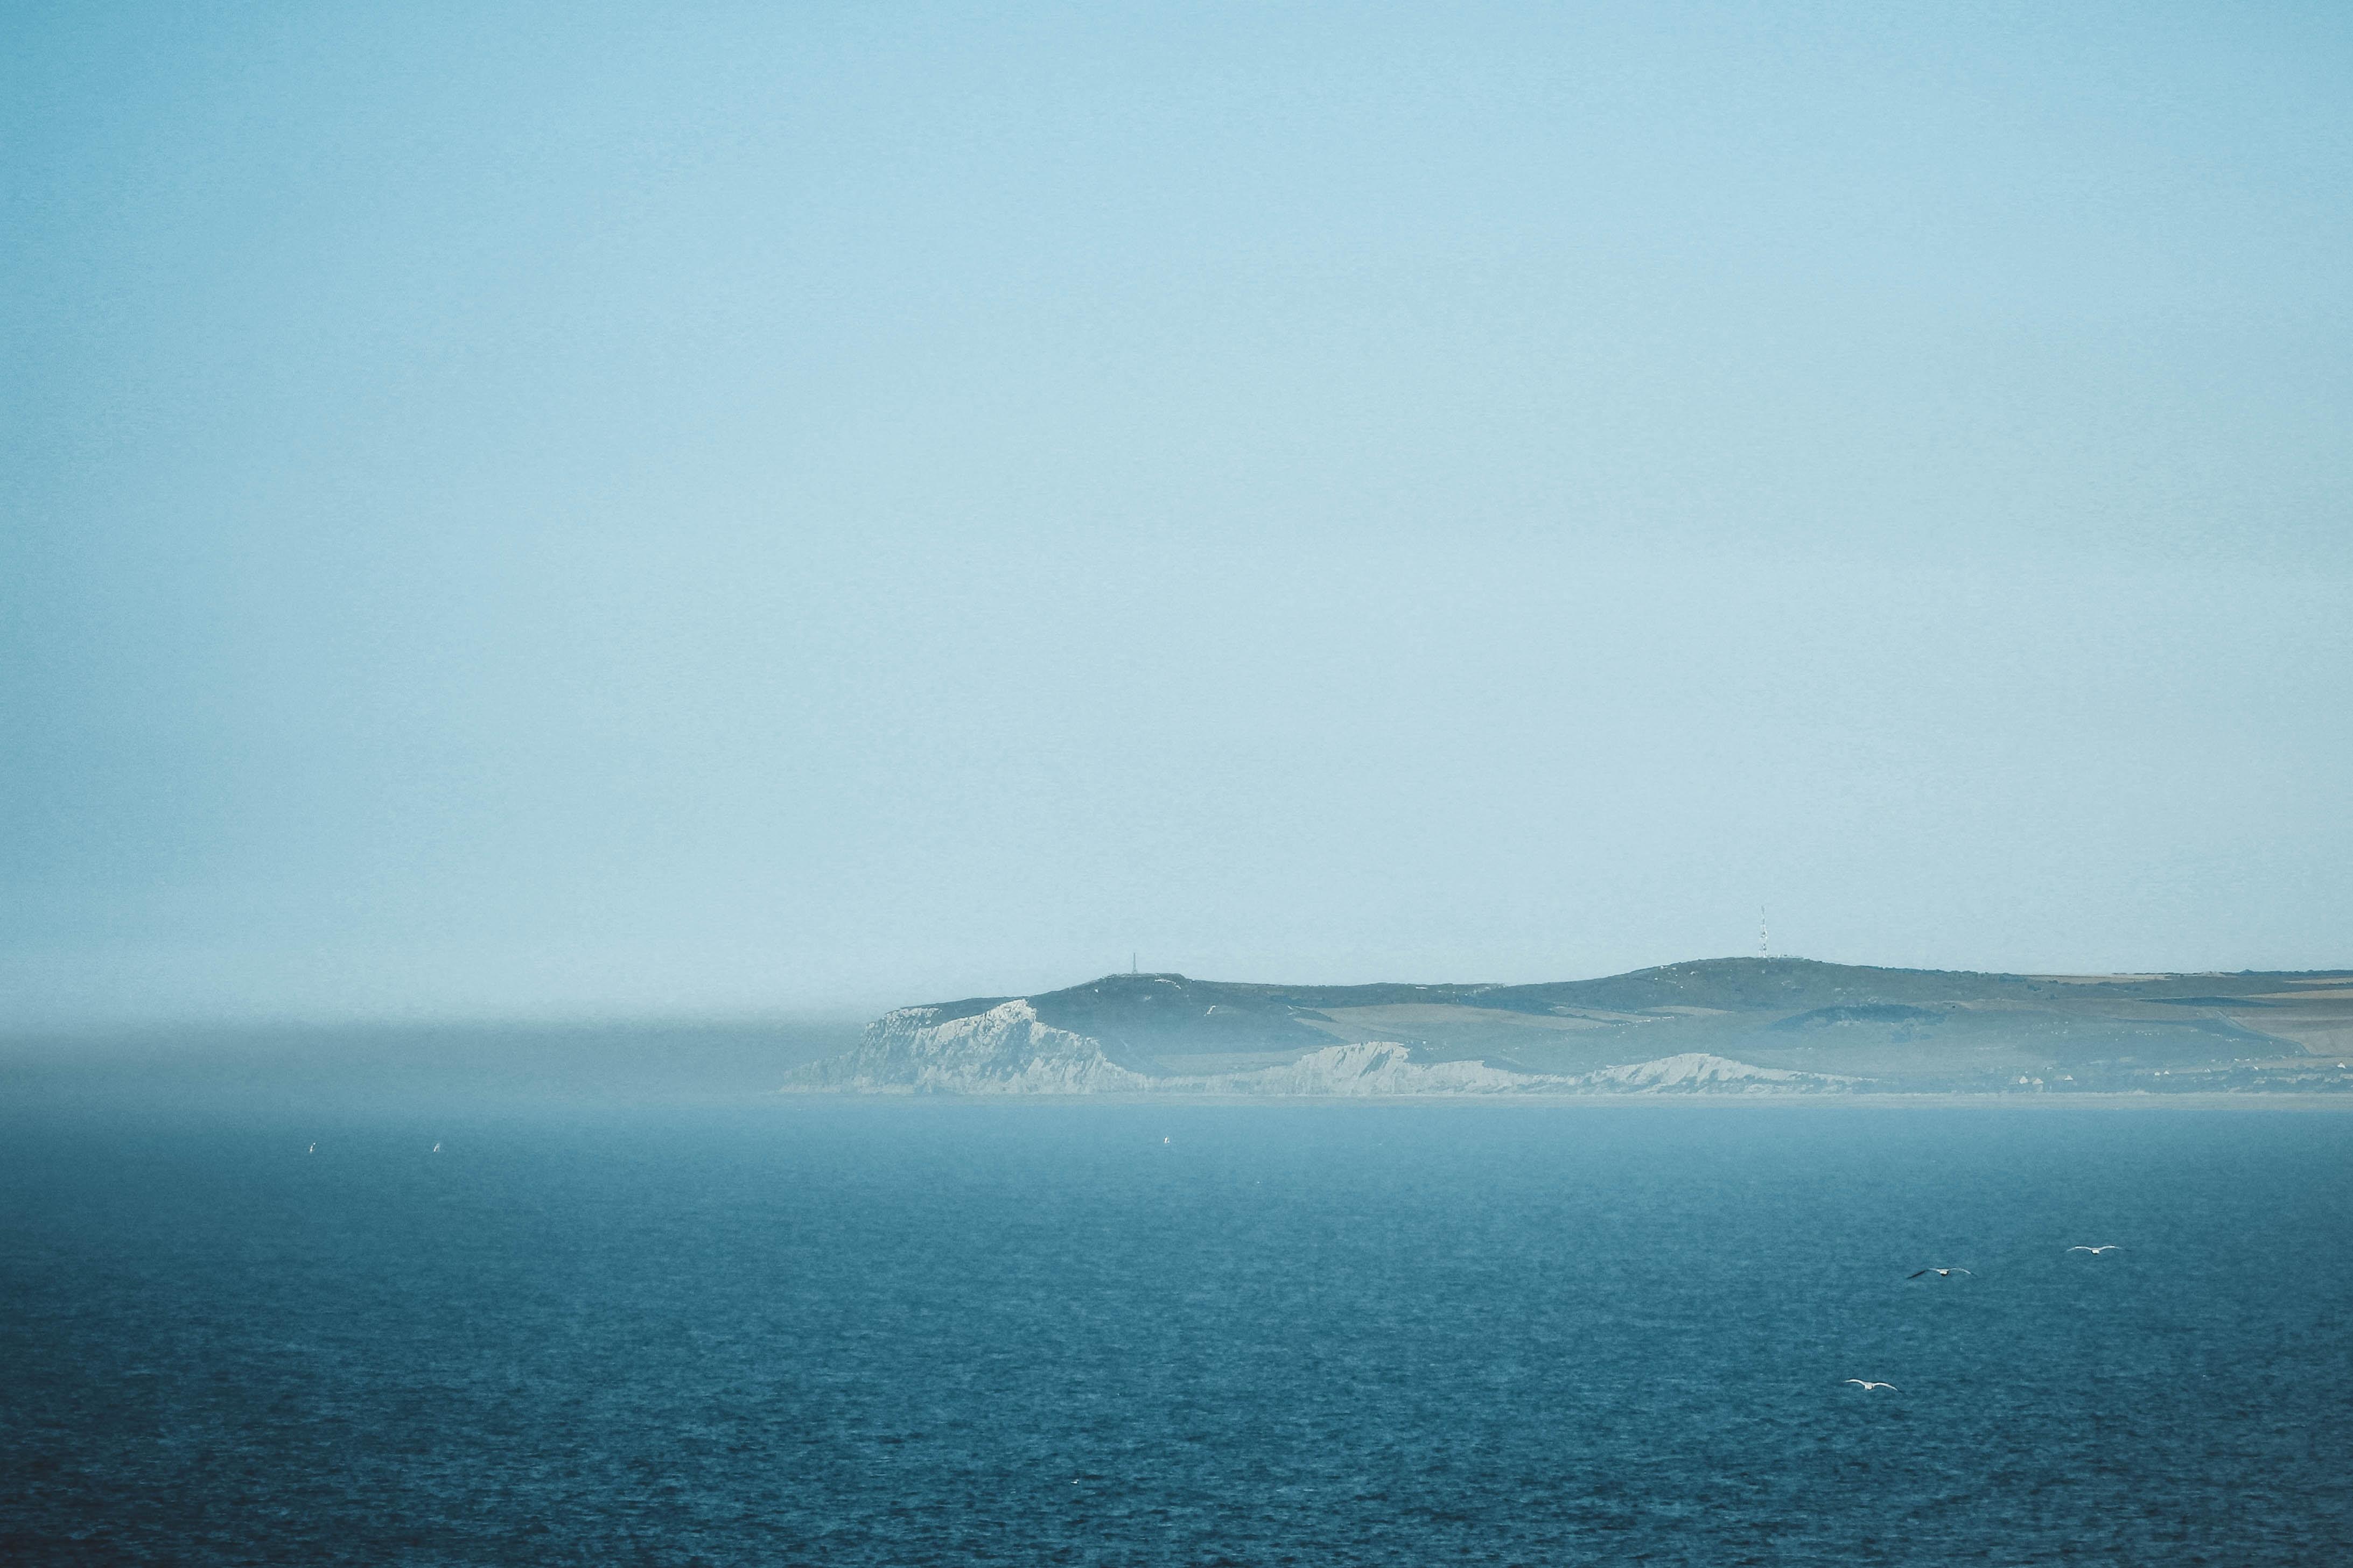 ocean under blue sky during daytime